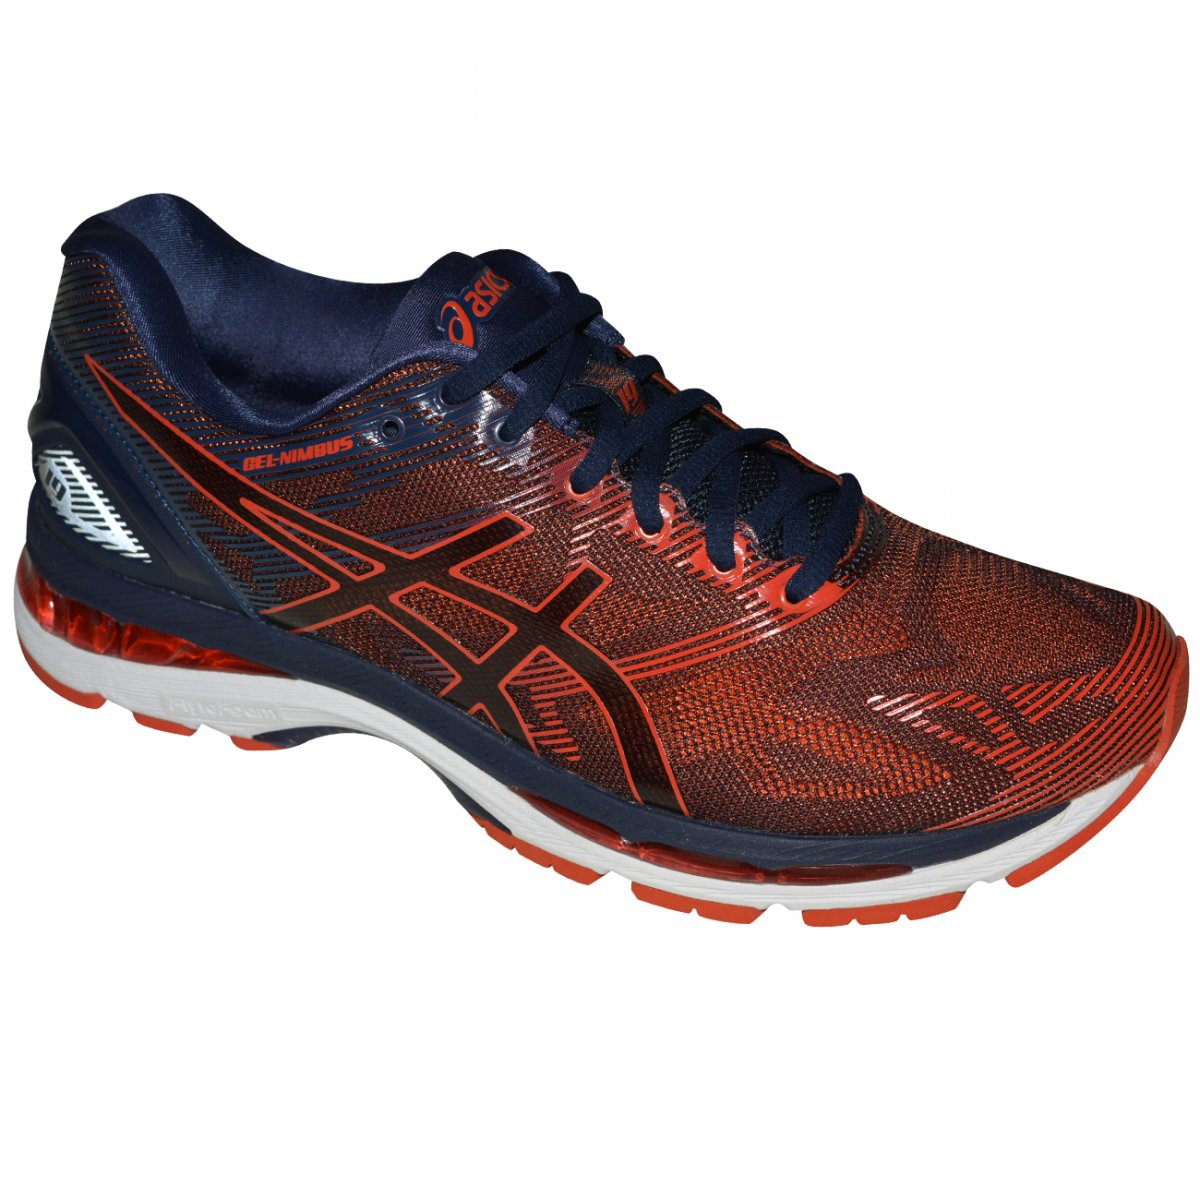 Tenis Asics Gel-nimbus 19 T700N 5806 - Vermelho marinho - Chuteira Nike 4e11995f3504c